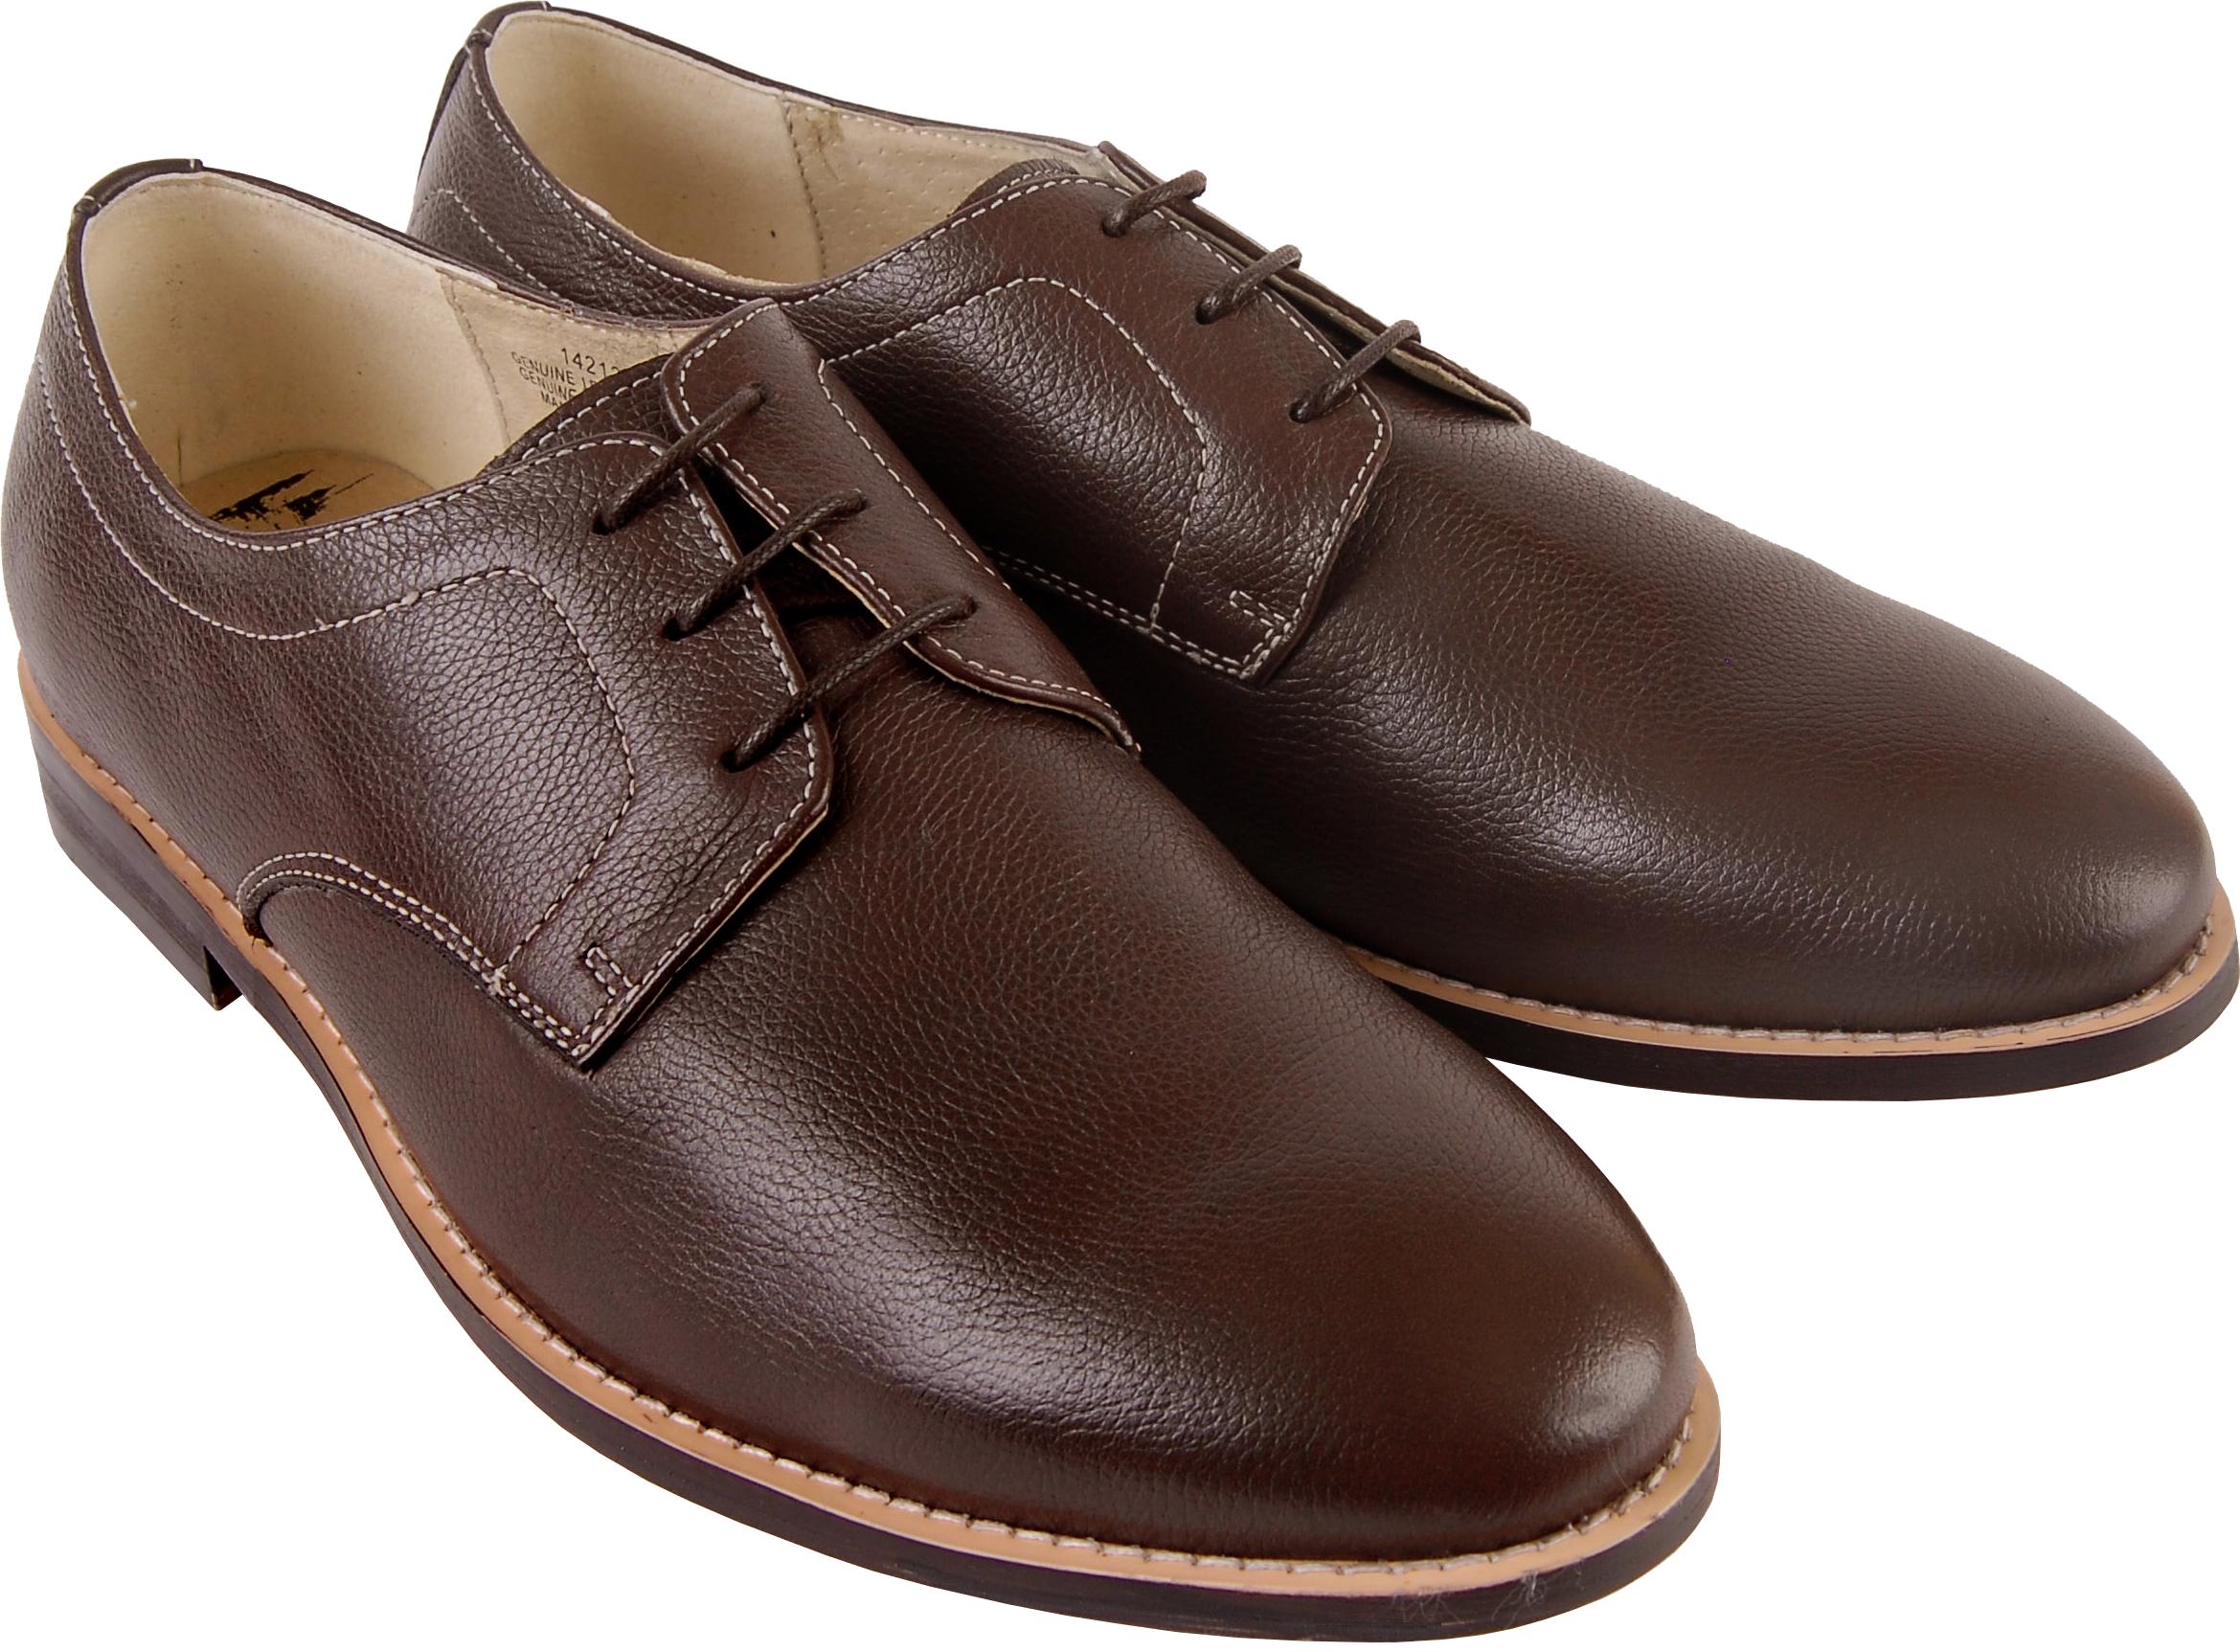 Brown men shoes PNG image - PNG HD Dance Shoes